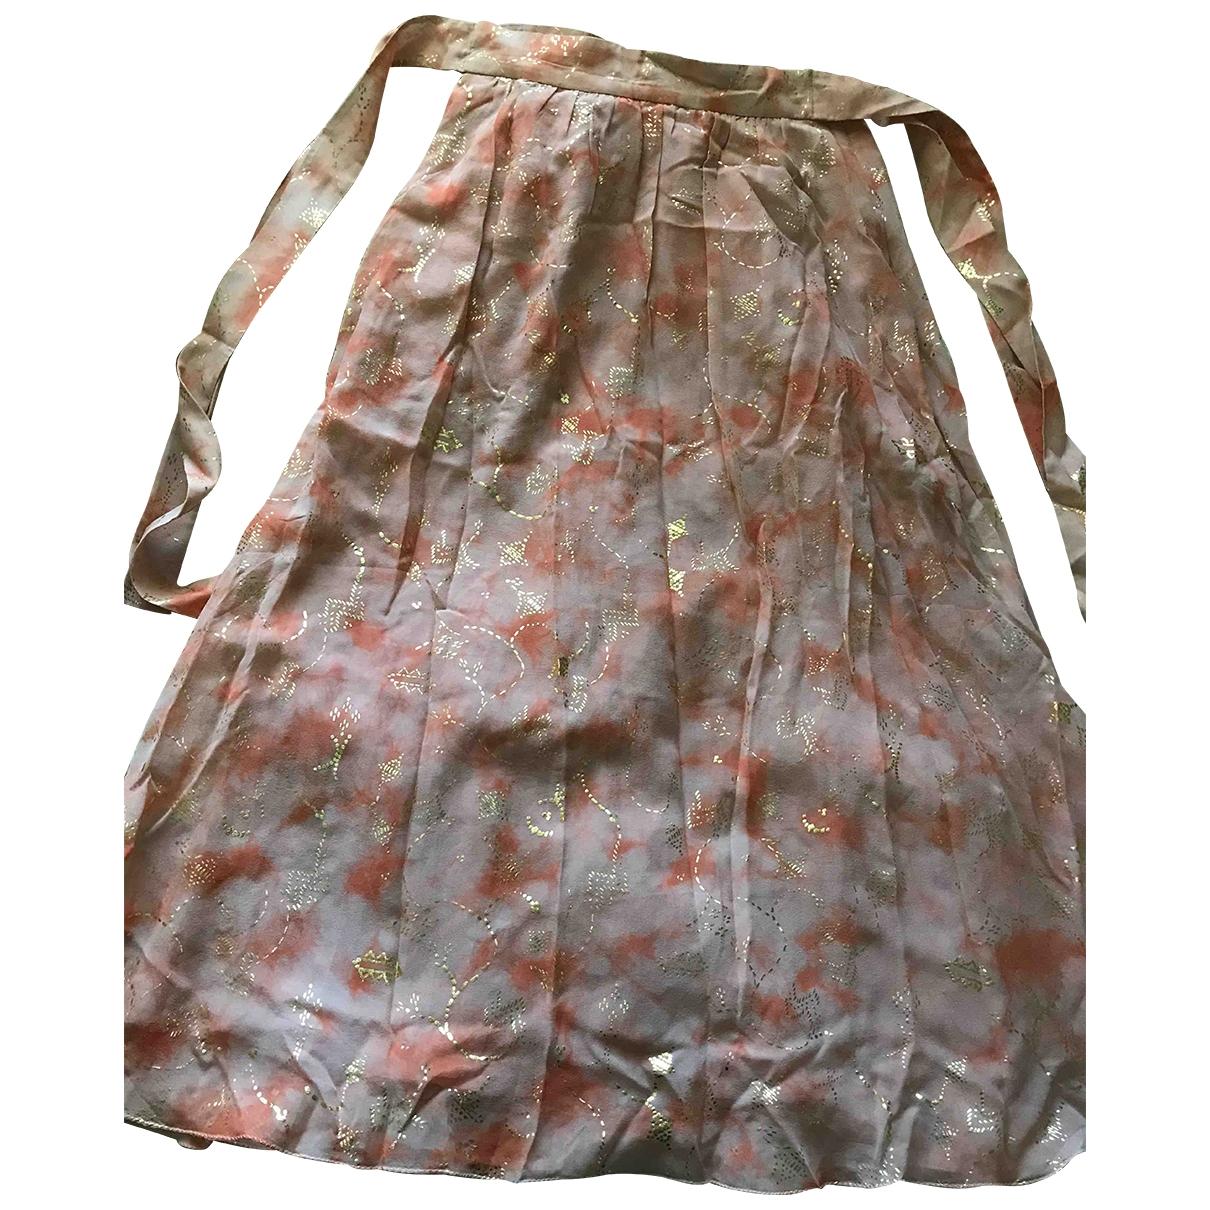 & Other Stories - Jupe   pour femme en soie - rose